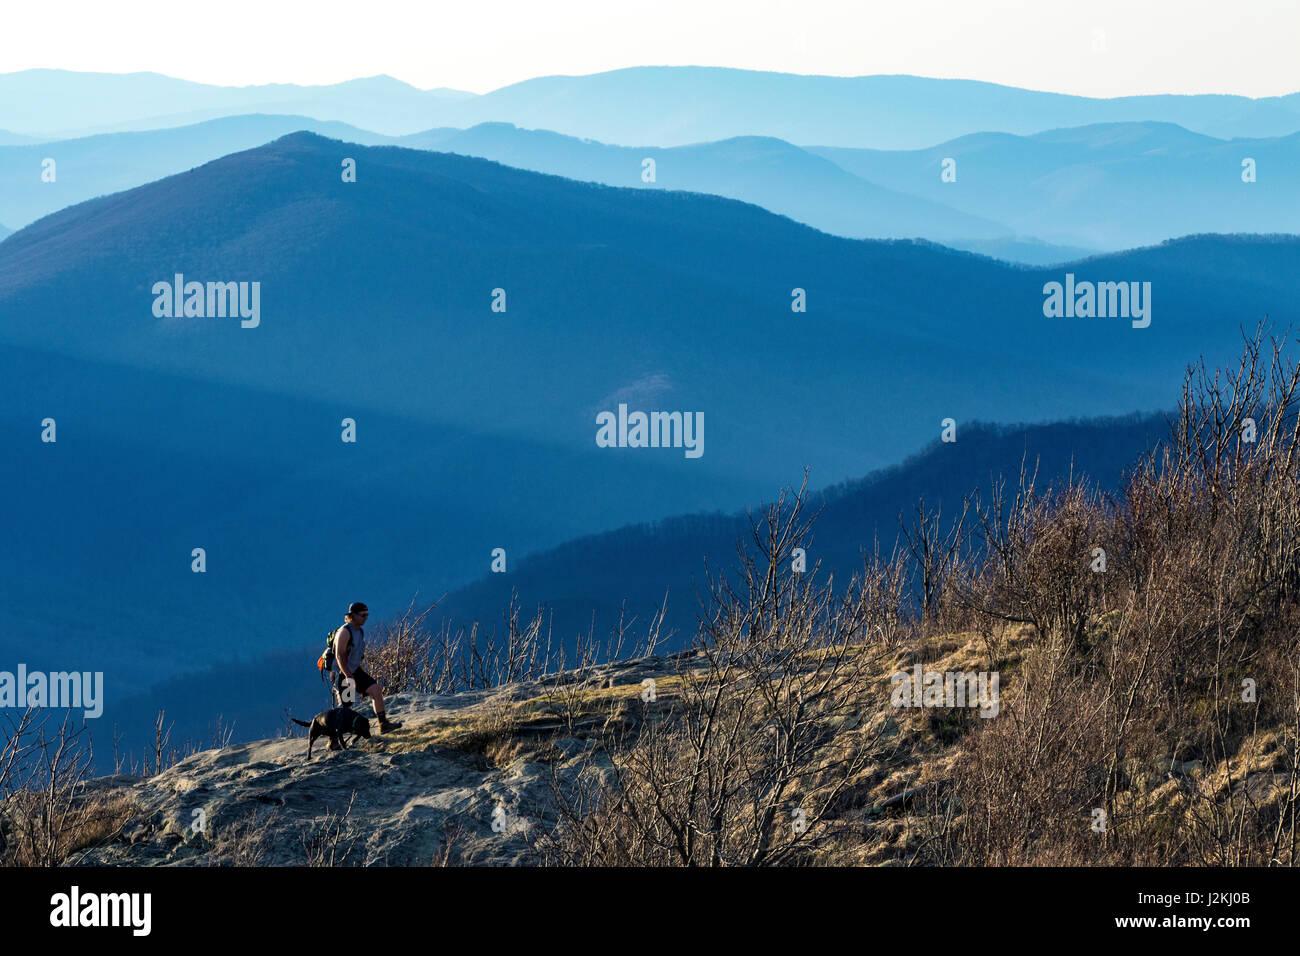 Hiker with dog on Art Loeb Trail near Black Balsam Knob - Blue Ridge Parkway, North Carolina, USA - Stock Image